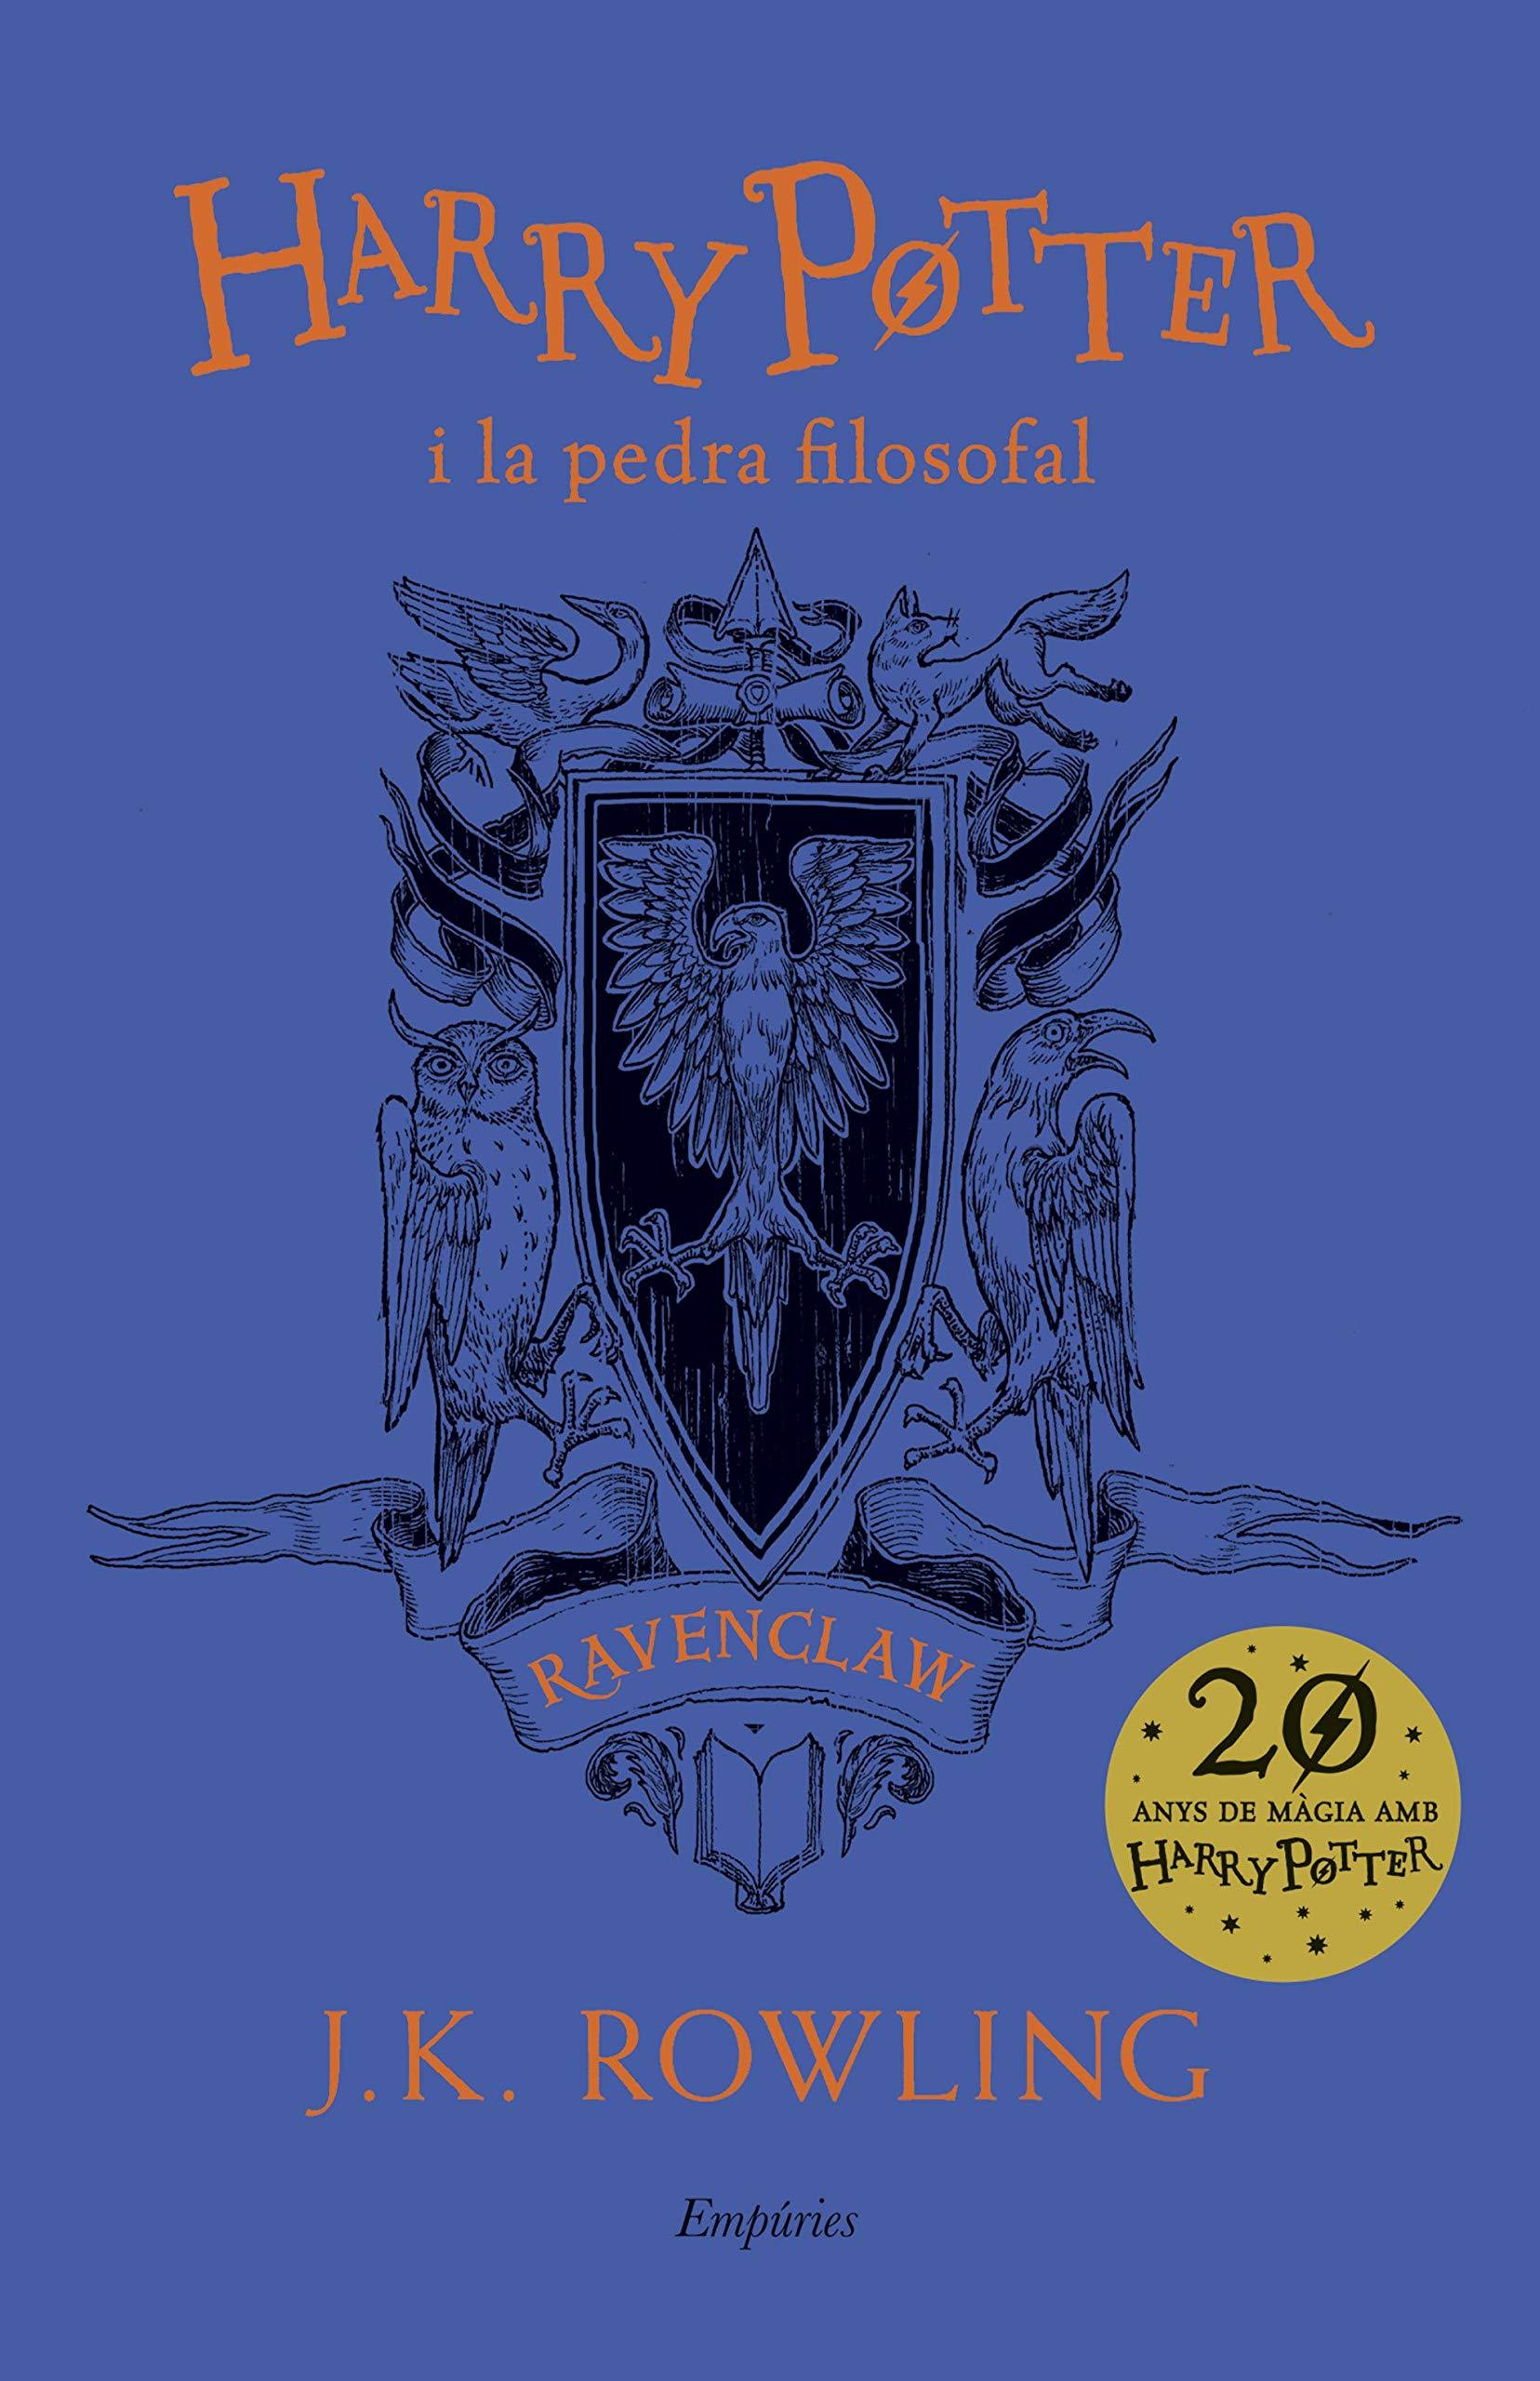 Harry Potter i la pedra filosofal Ravenclaw SERIE HARRY POTTER: Amazon.es: Rowling, J.K., Escorihuela Martínez, Laura, Riera Arbussà, Ernest: Libros